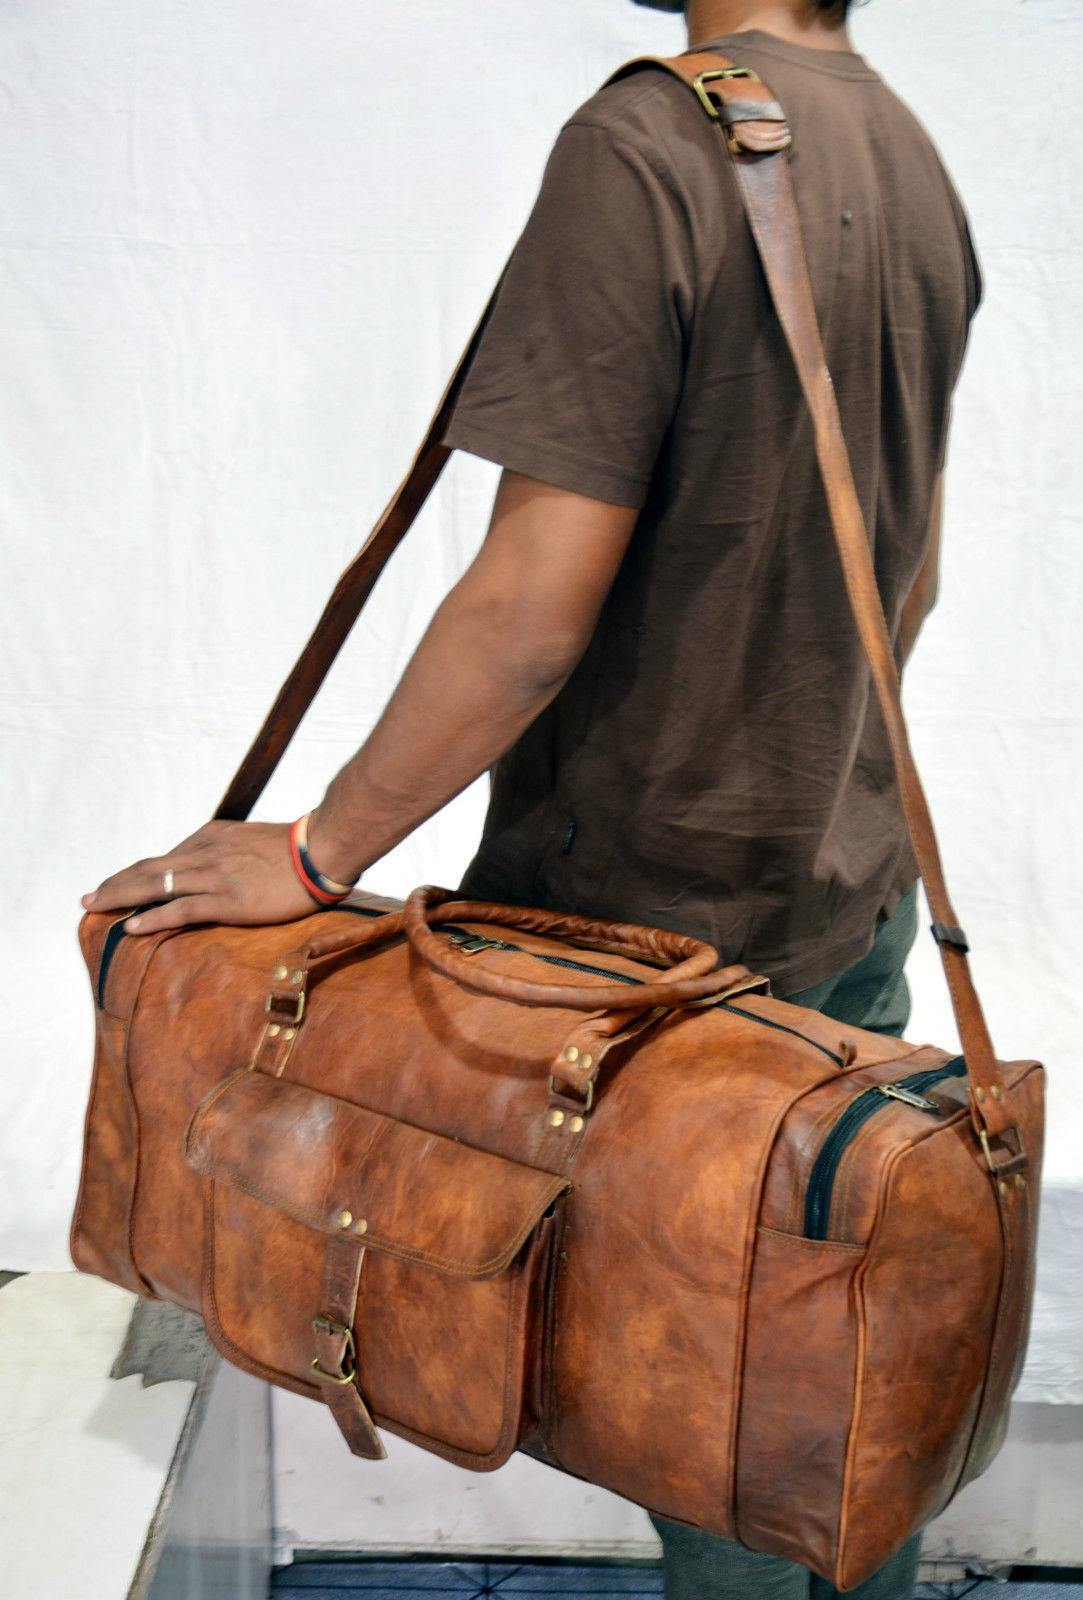 New Bag Leather Travel Men Retro Handmade Duffle Luggage Gym Weekend Shoulder